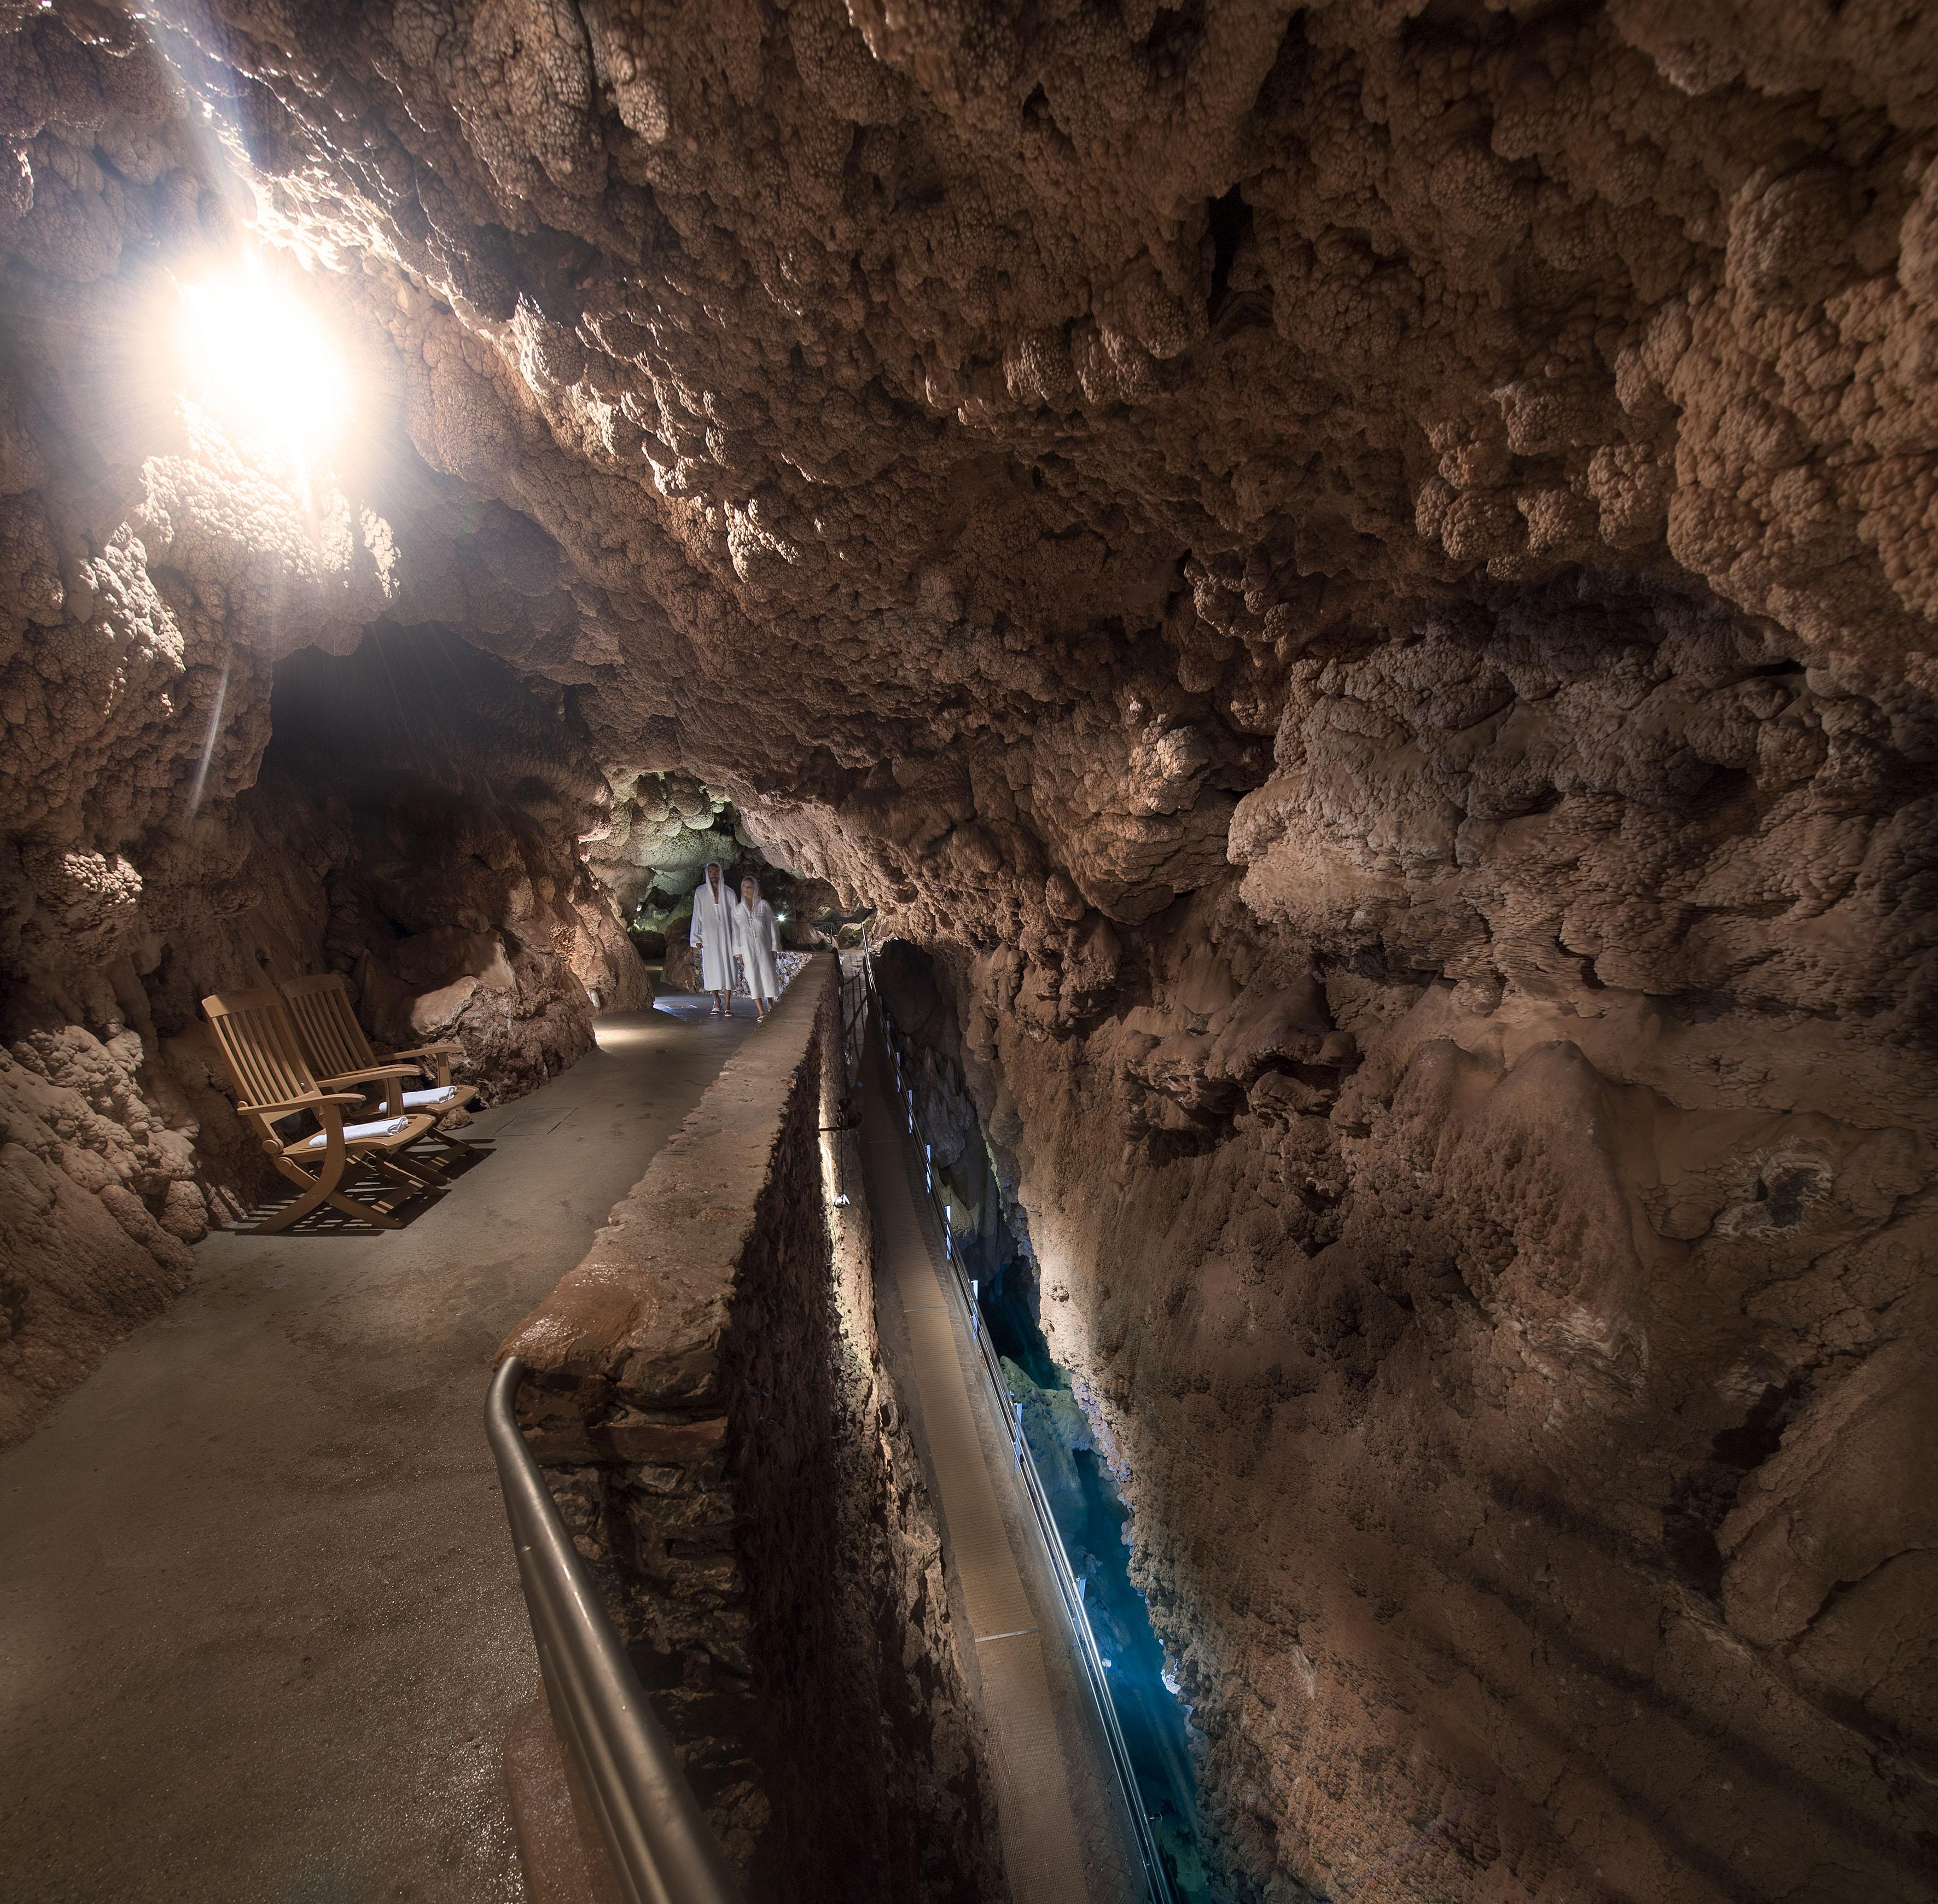 Grotta Giusti_The Natural Spa_The Thermal Grotta_Underground Lake